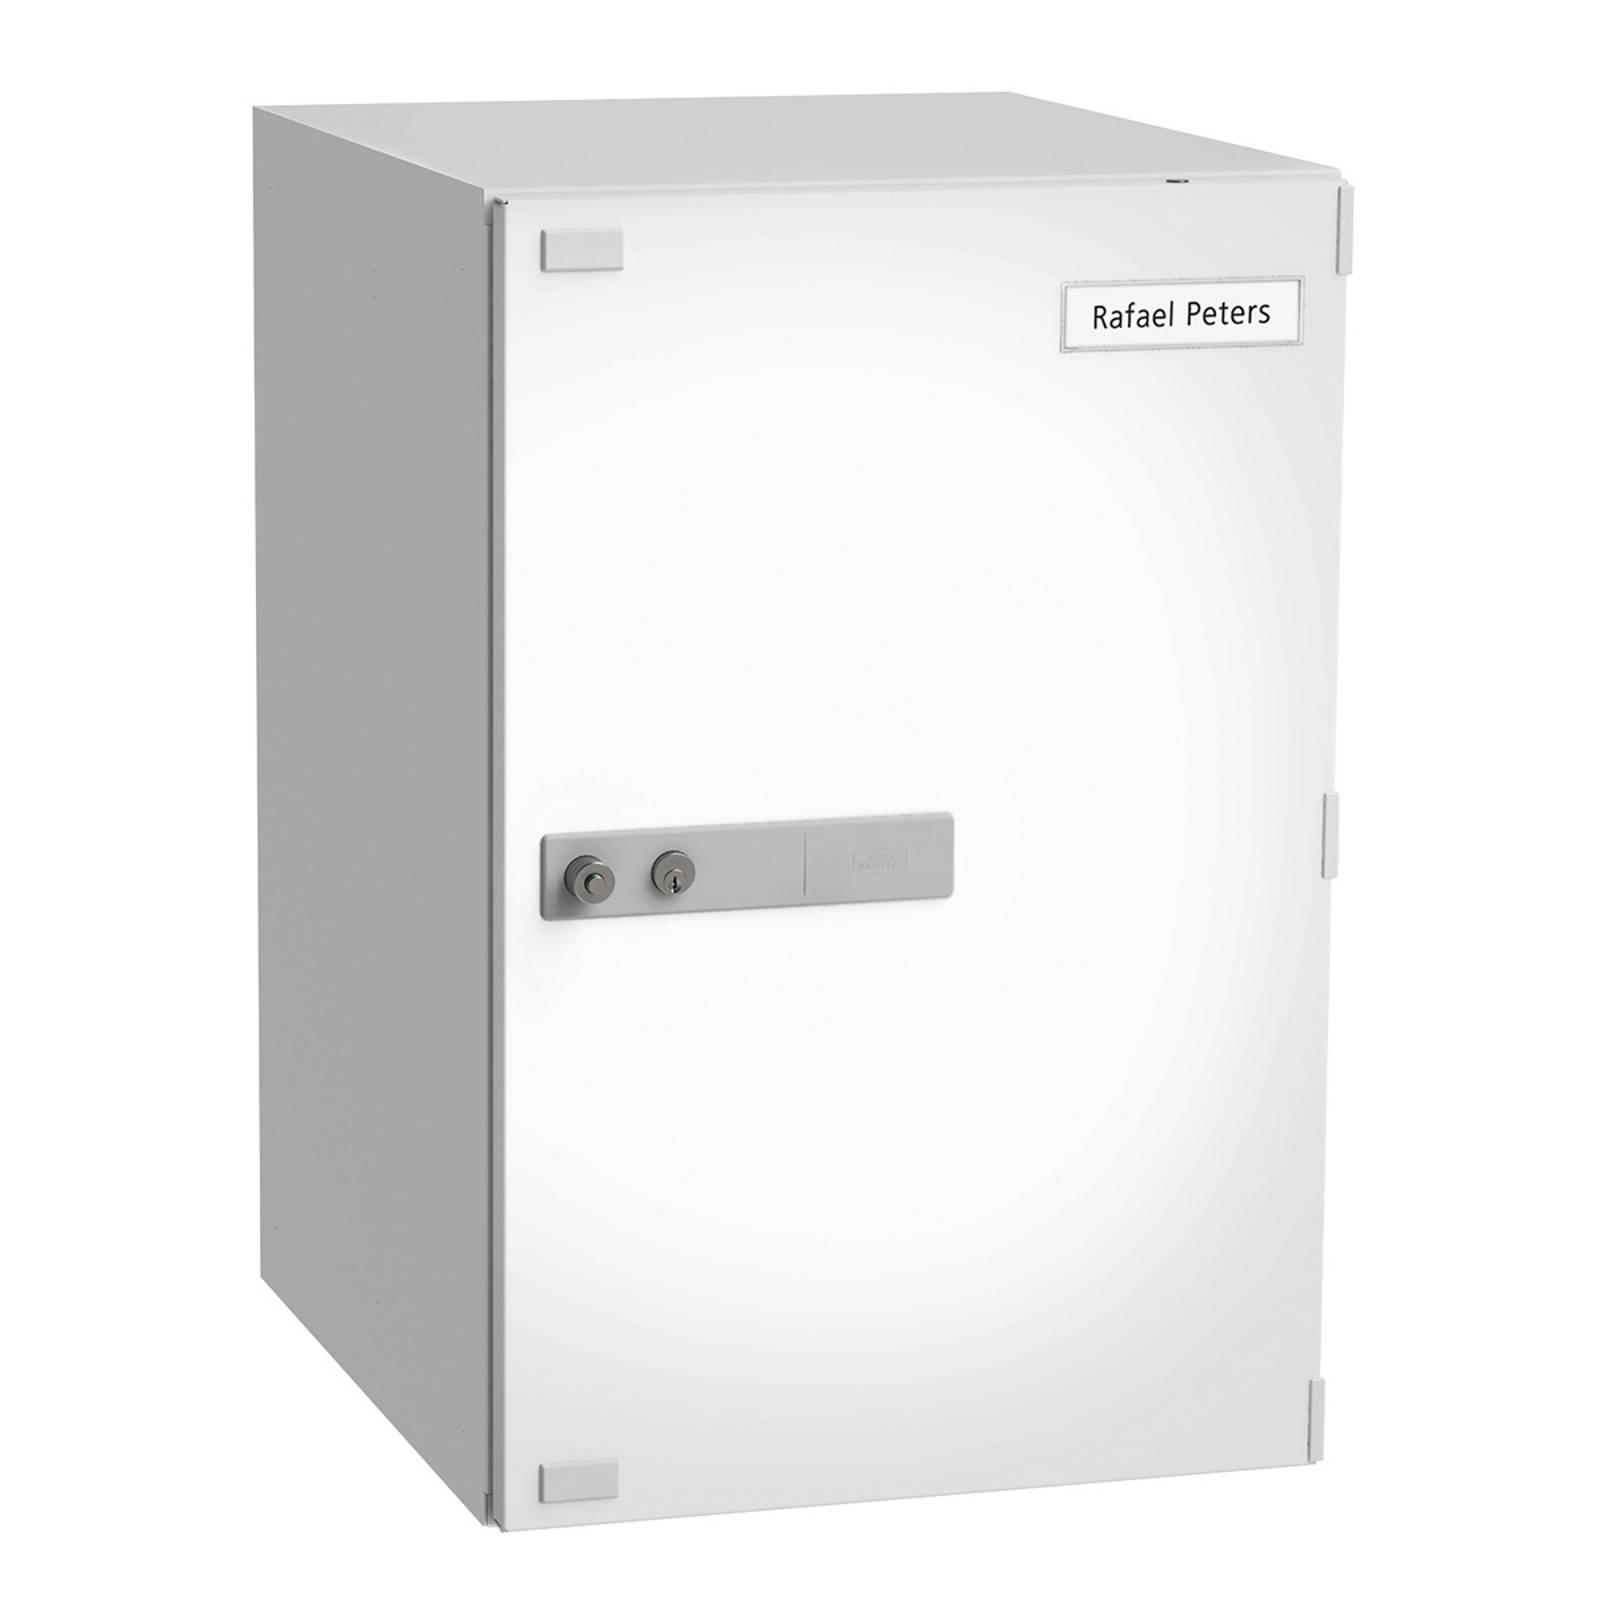 Tilavuus 98 L - pakettilaatikko eBoxx, 57,5cm